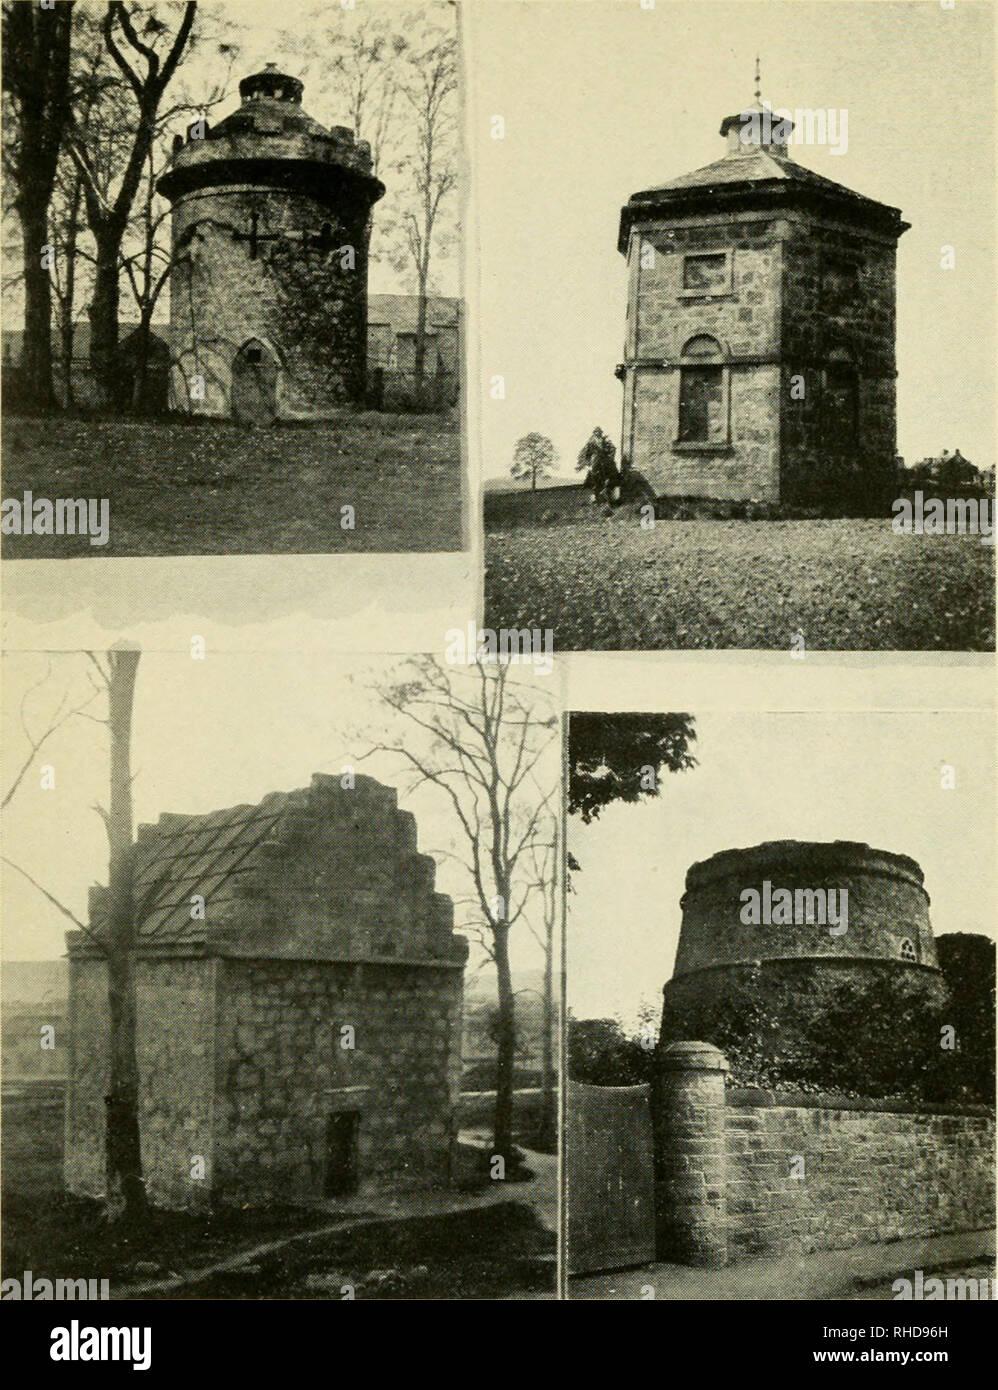 Dumbartonshire Stock Photos & Dumbartonshire Stock Images - Page 3